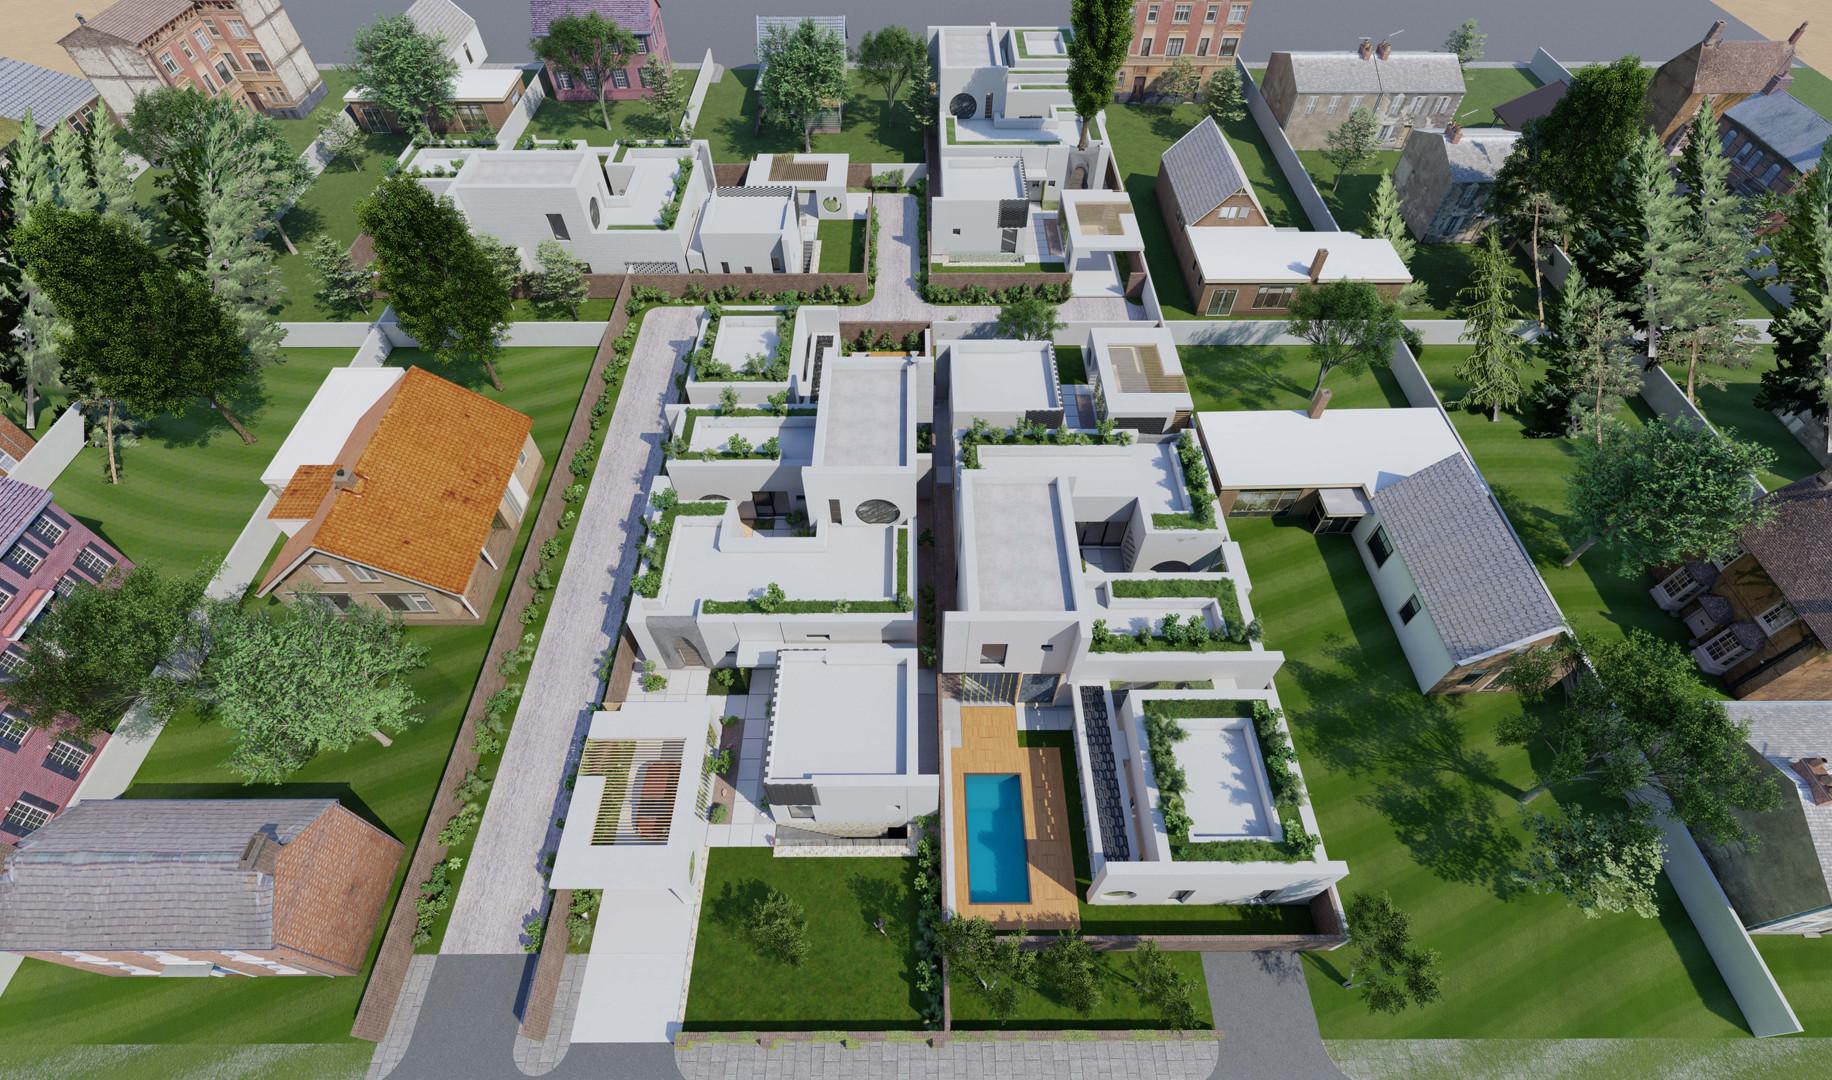 4 Houses Aerial